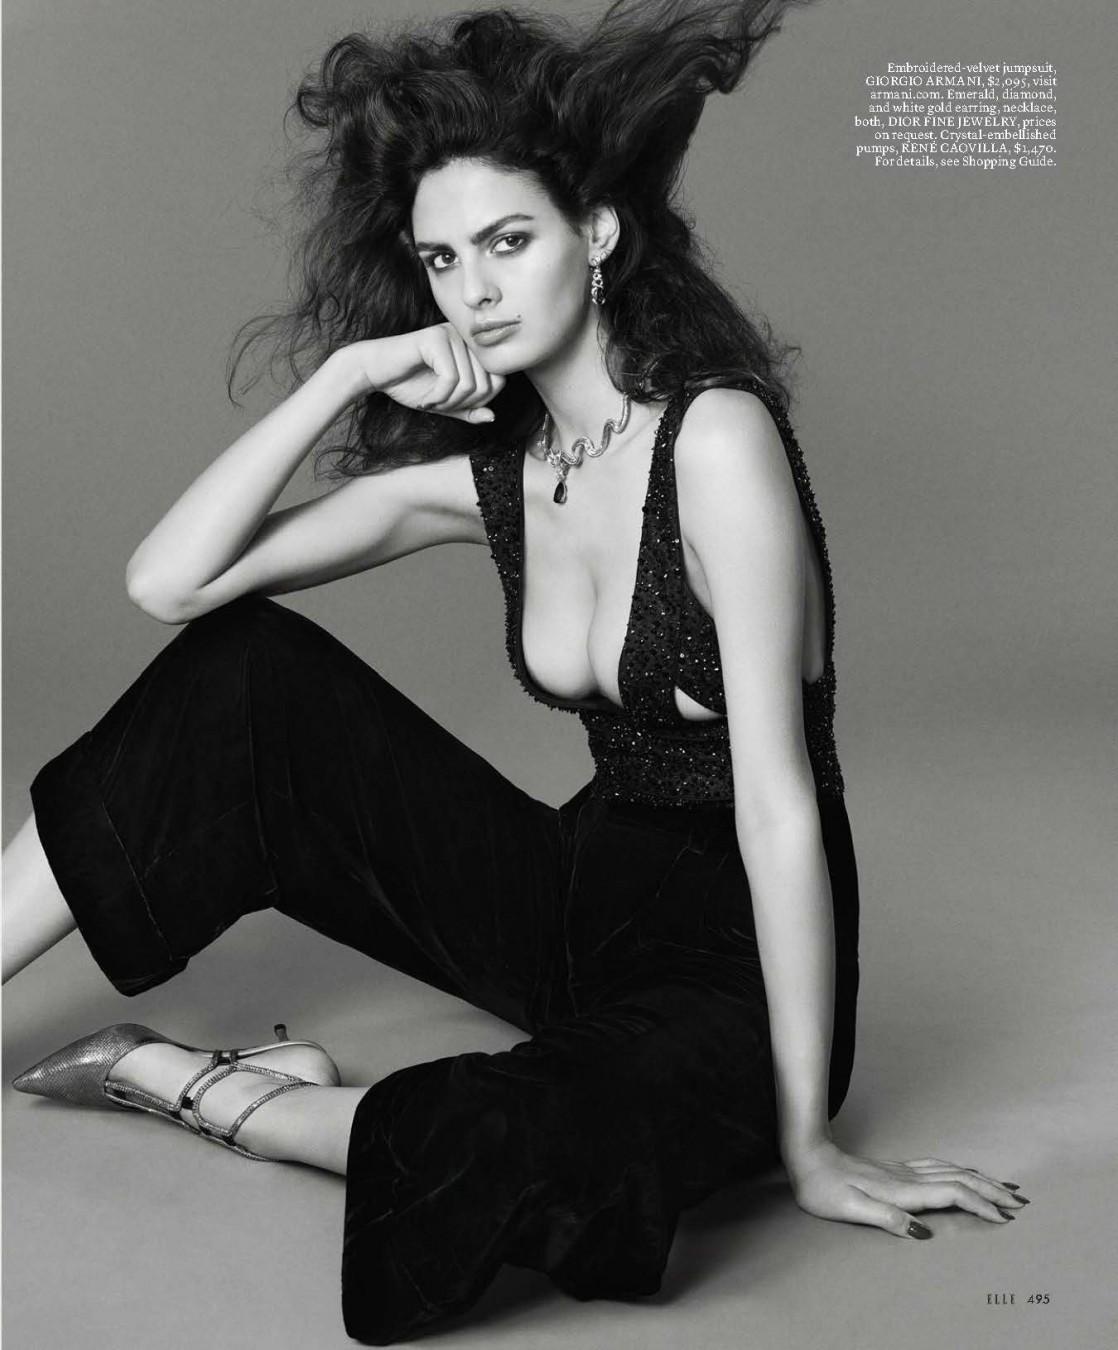 Bojana Krsmanovic Pictures. Hotness Rating = 9.20/10